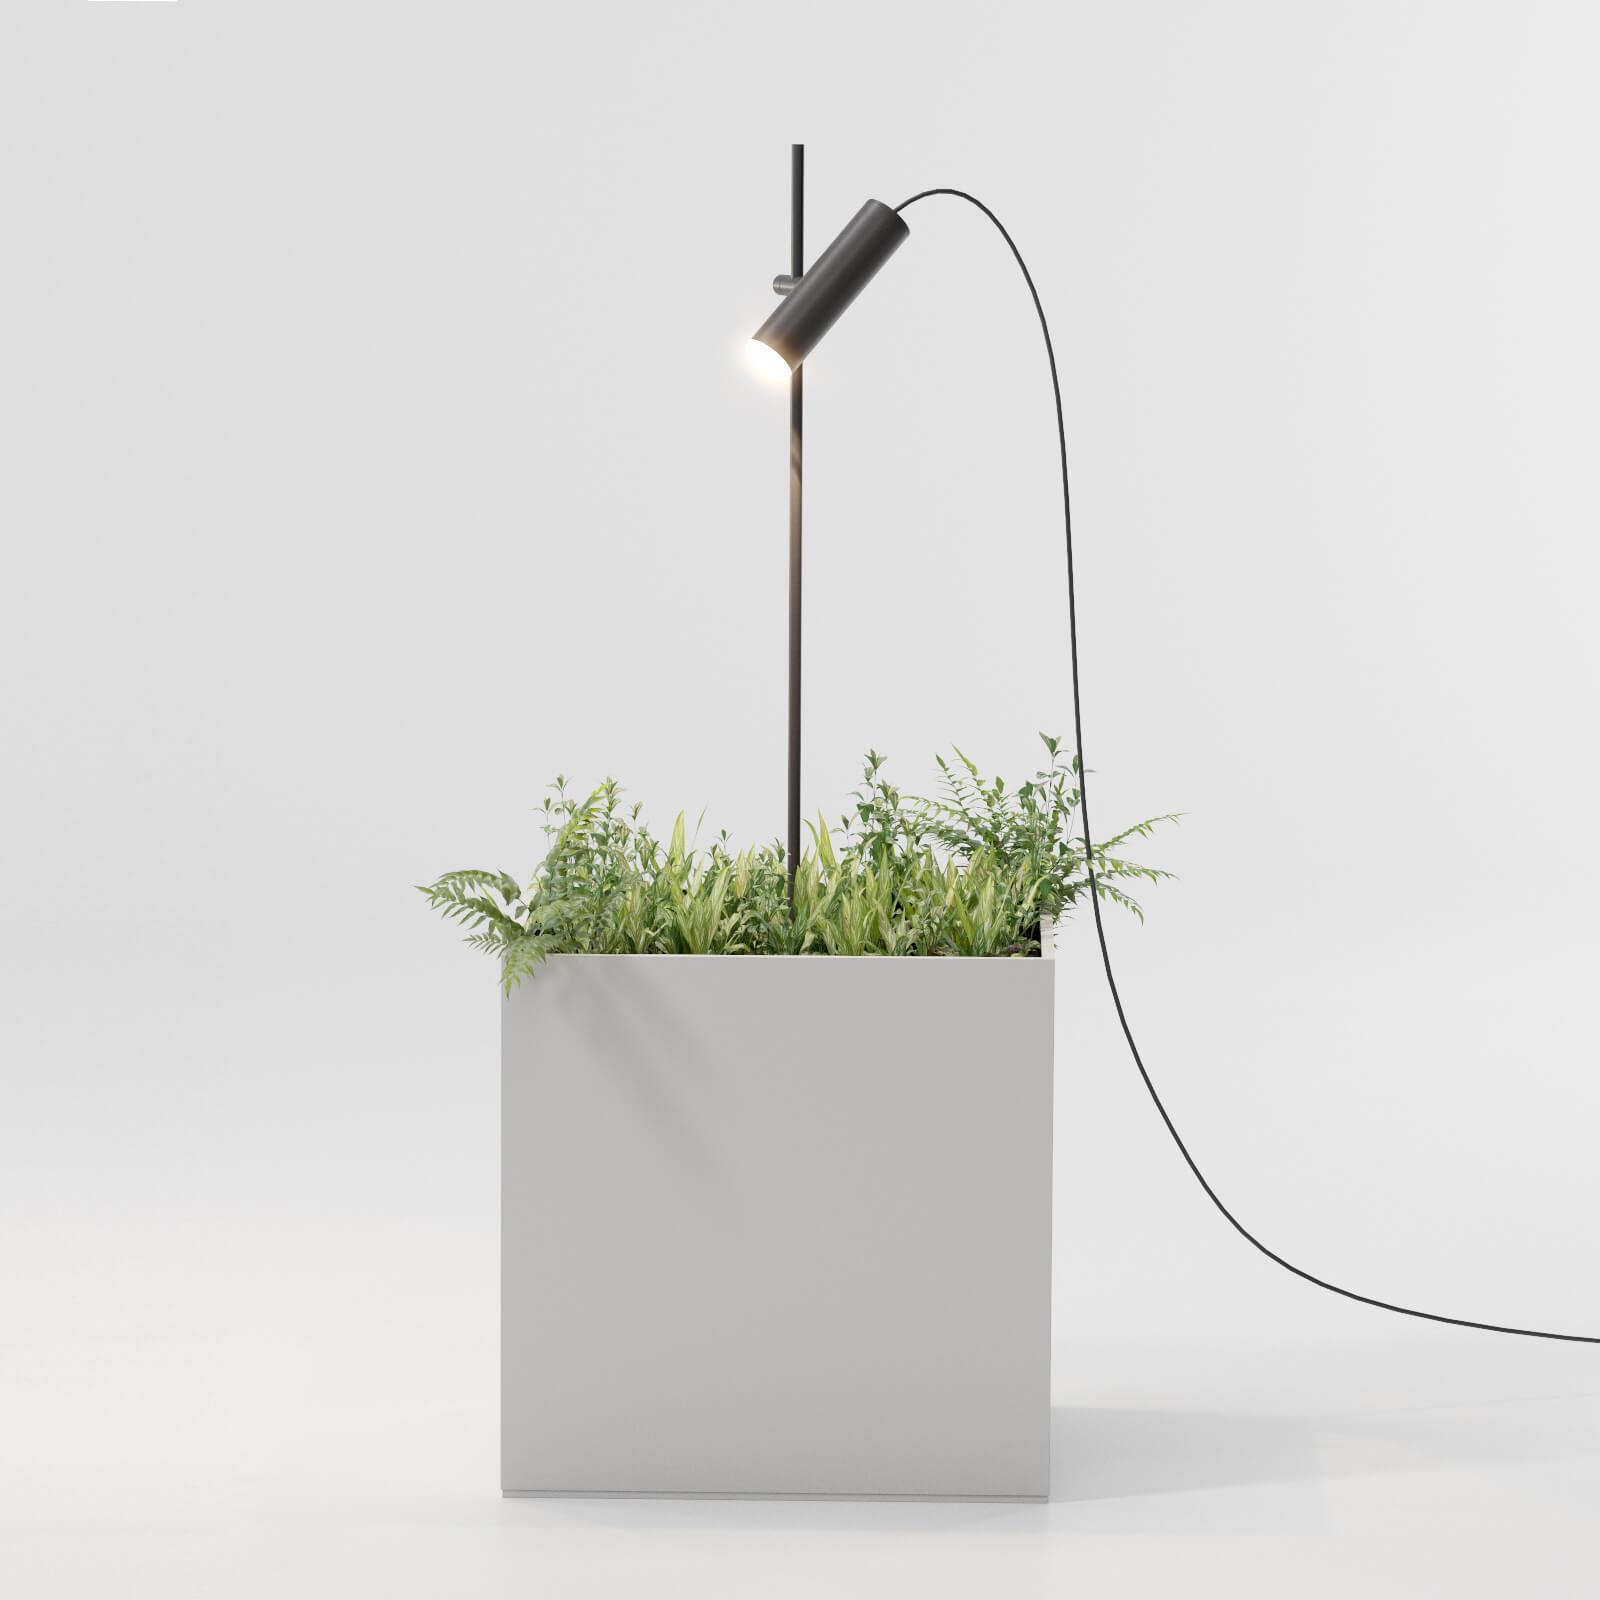 1599_0_Dots_bollard_planter_lamp___SQ.jpg